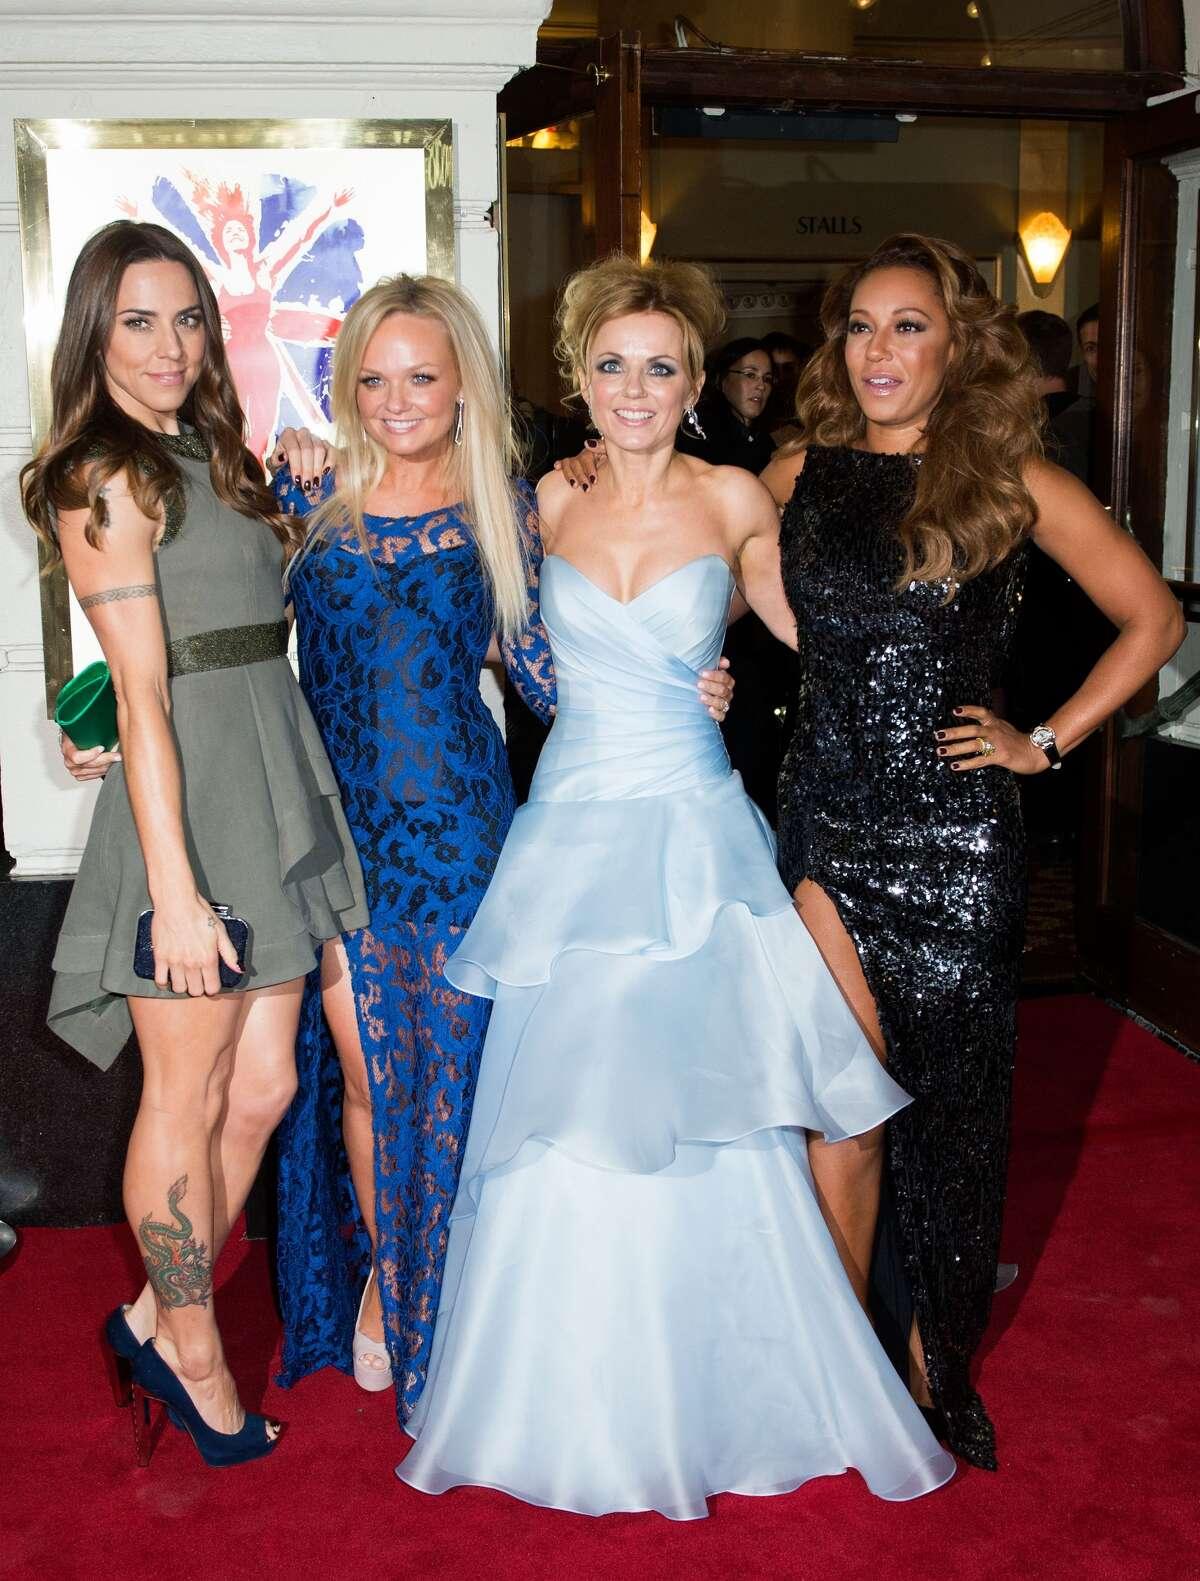 One spice shy, Melanie Chisholm, Emma Bunton, Geri Halliwell and Melanie Brown pose for a photo in 2012.